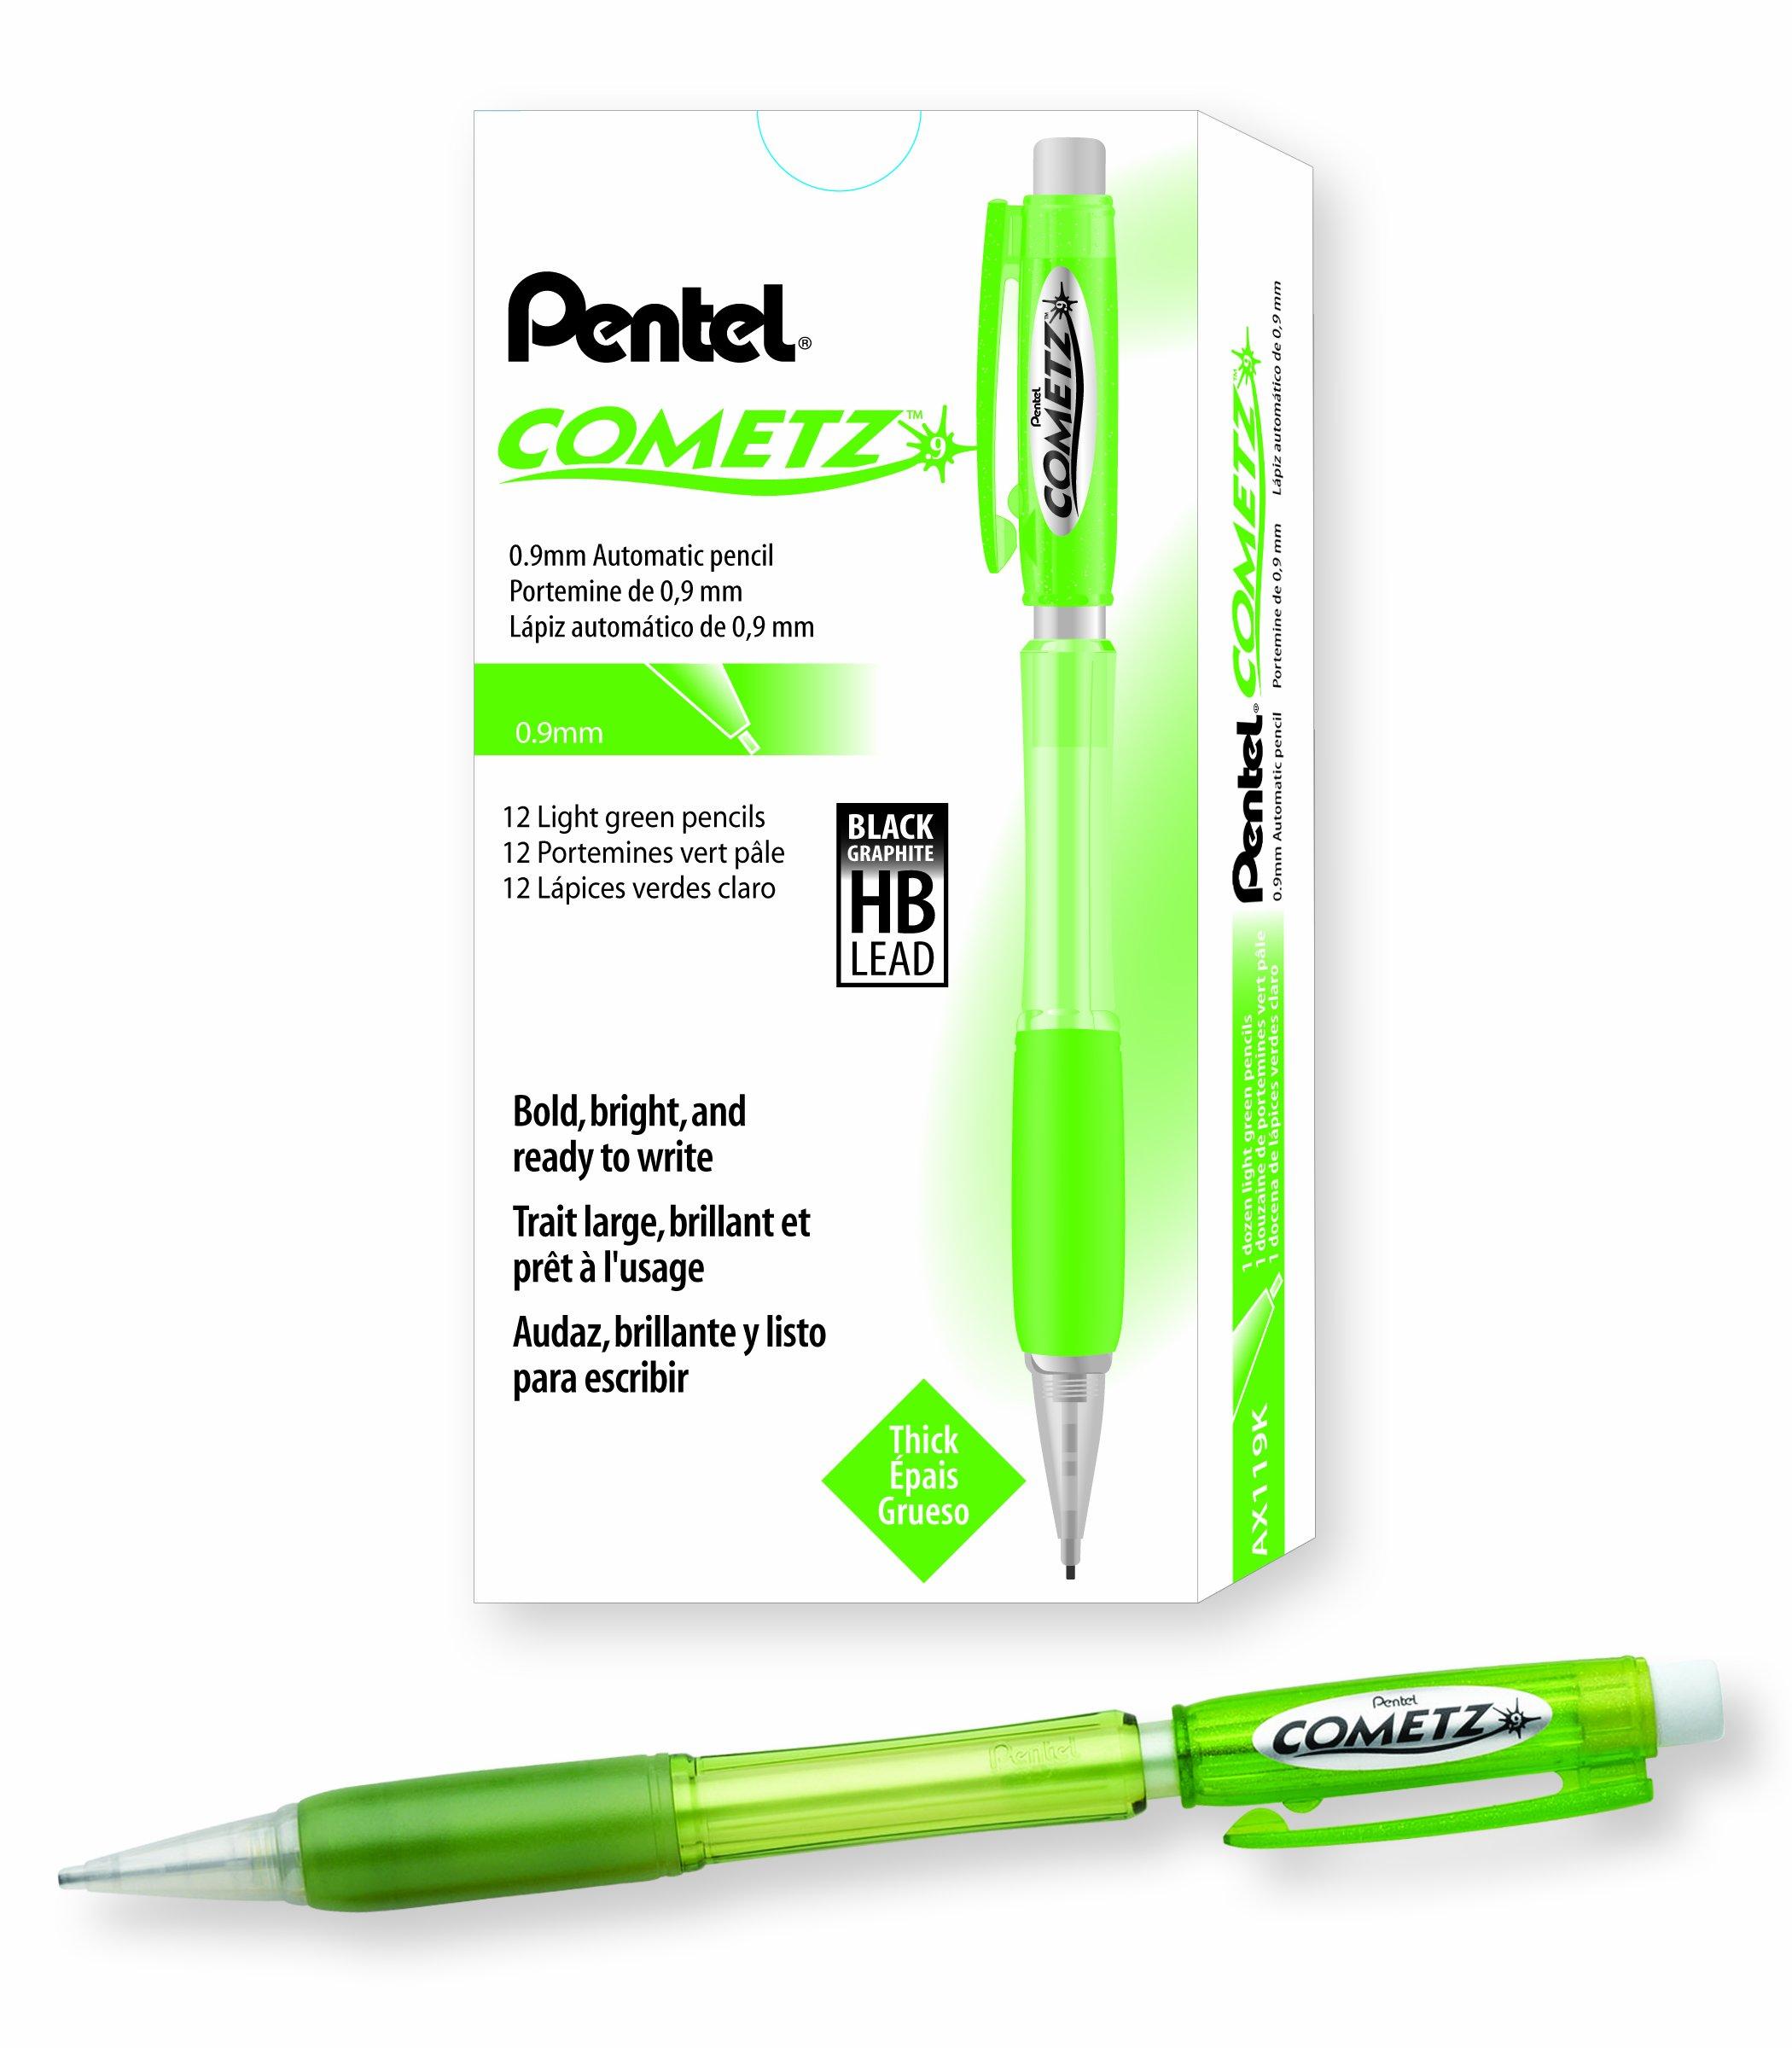 24/HB color blanco 2/x cebra delguard portaminas HB 0,5/mm barril de 5/gomas de borrar